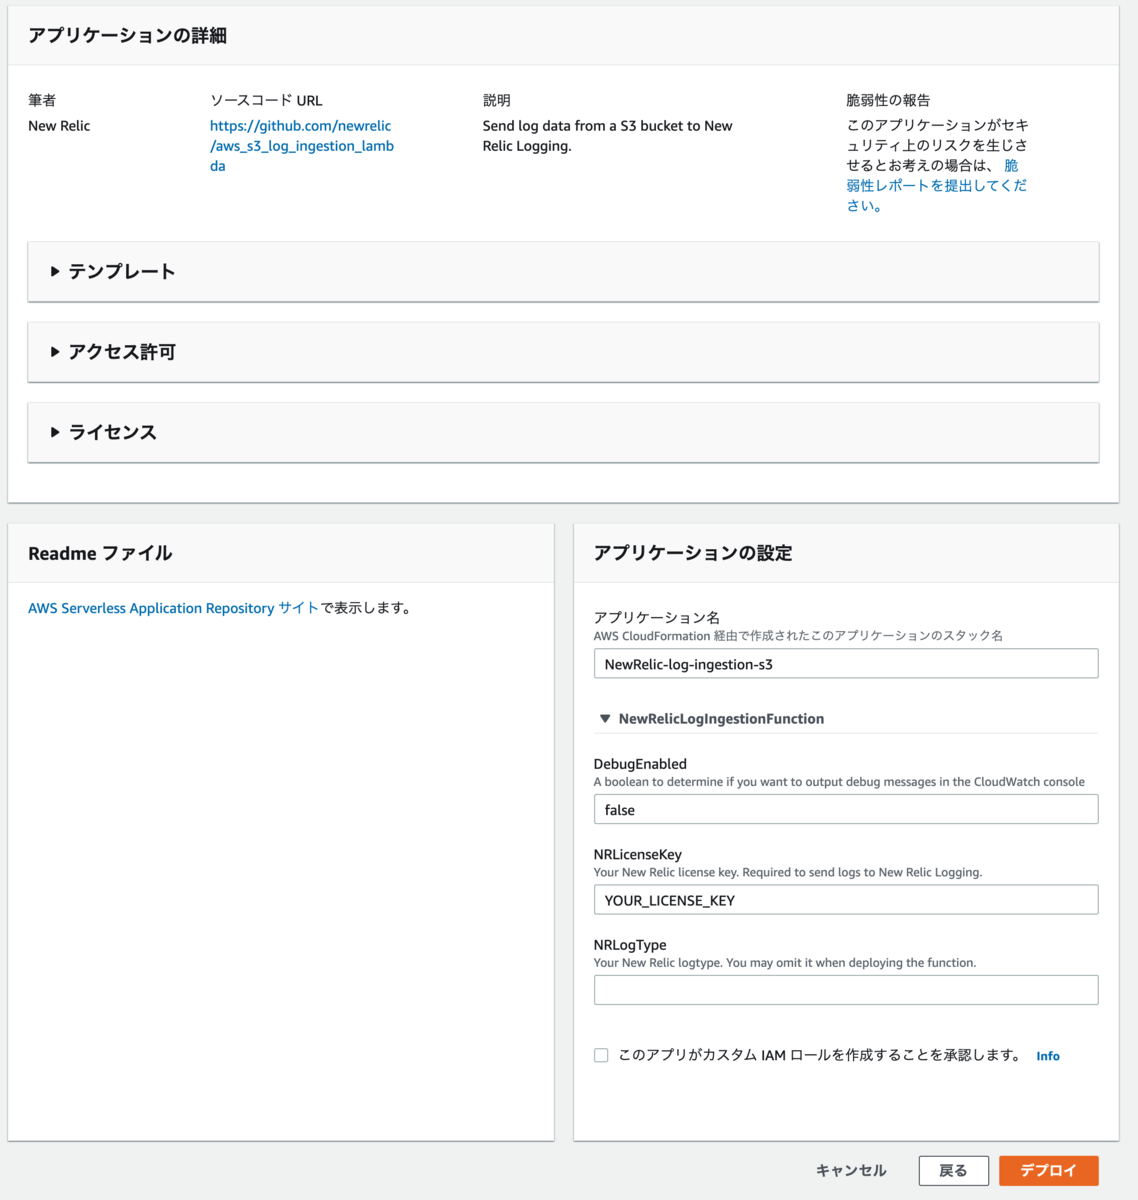 f:id:otyamurao:20210929111430p:plain